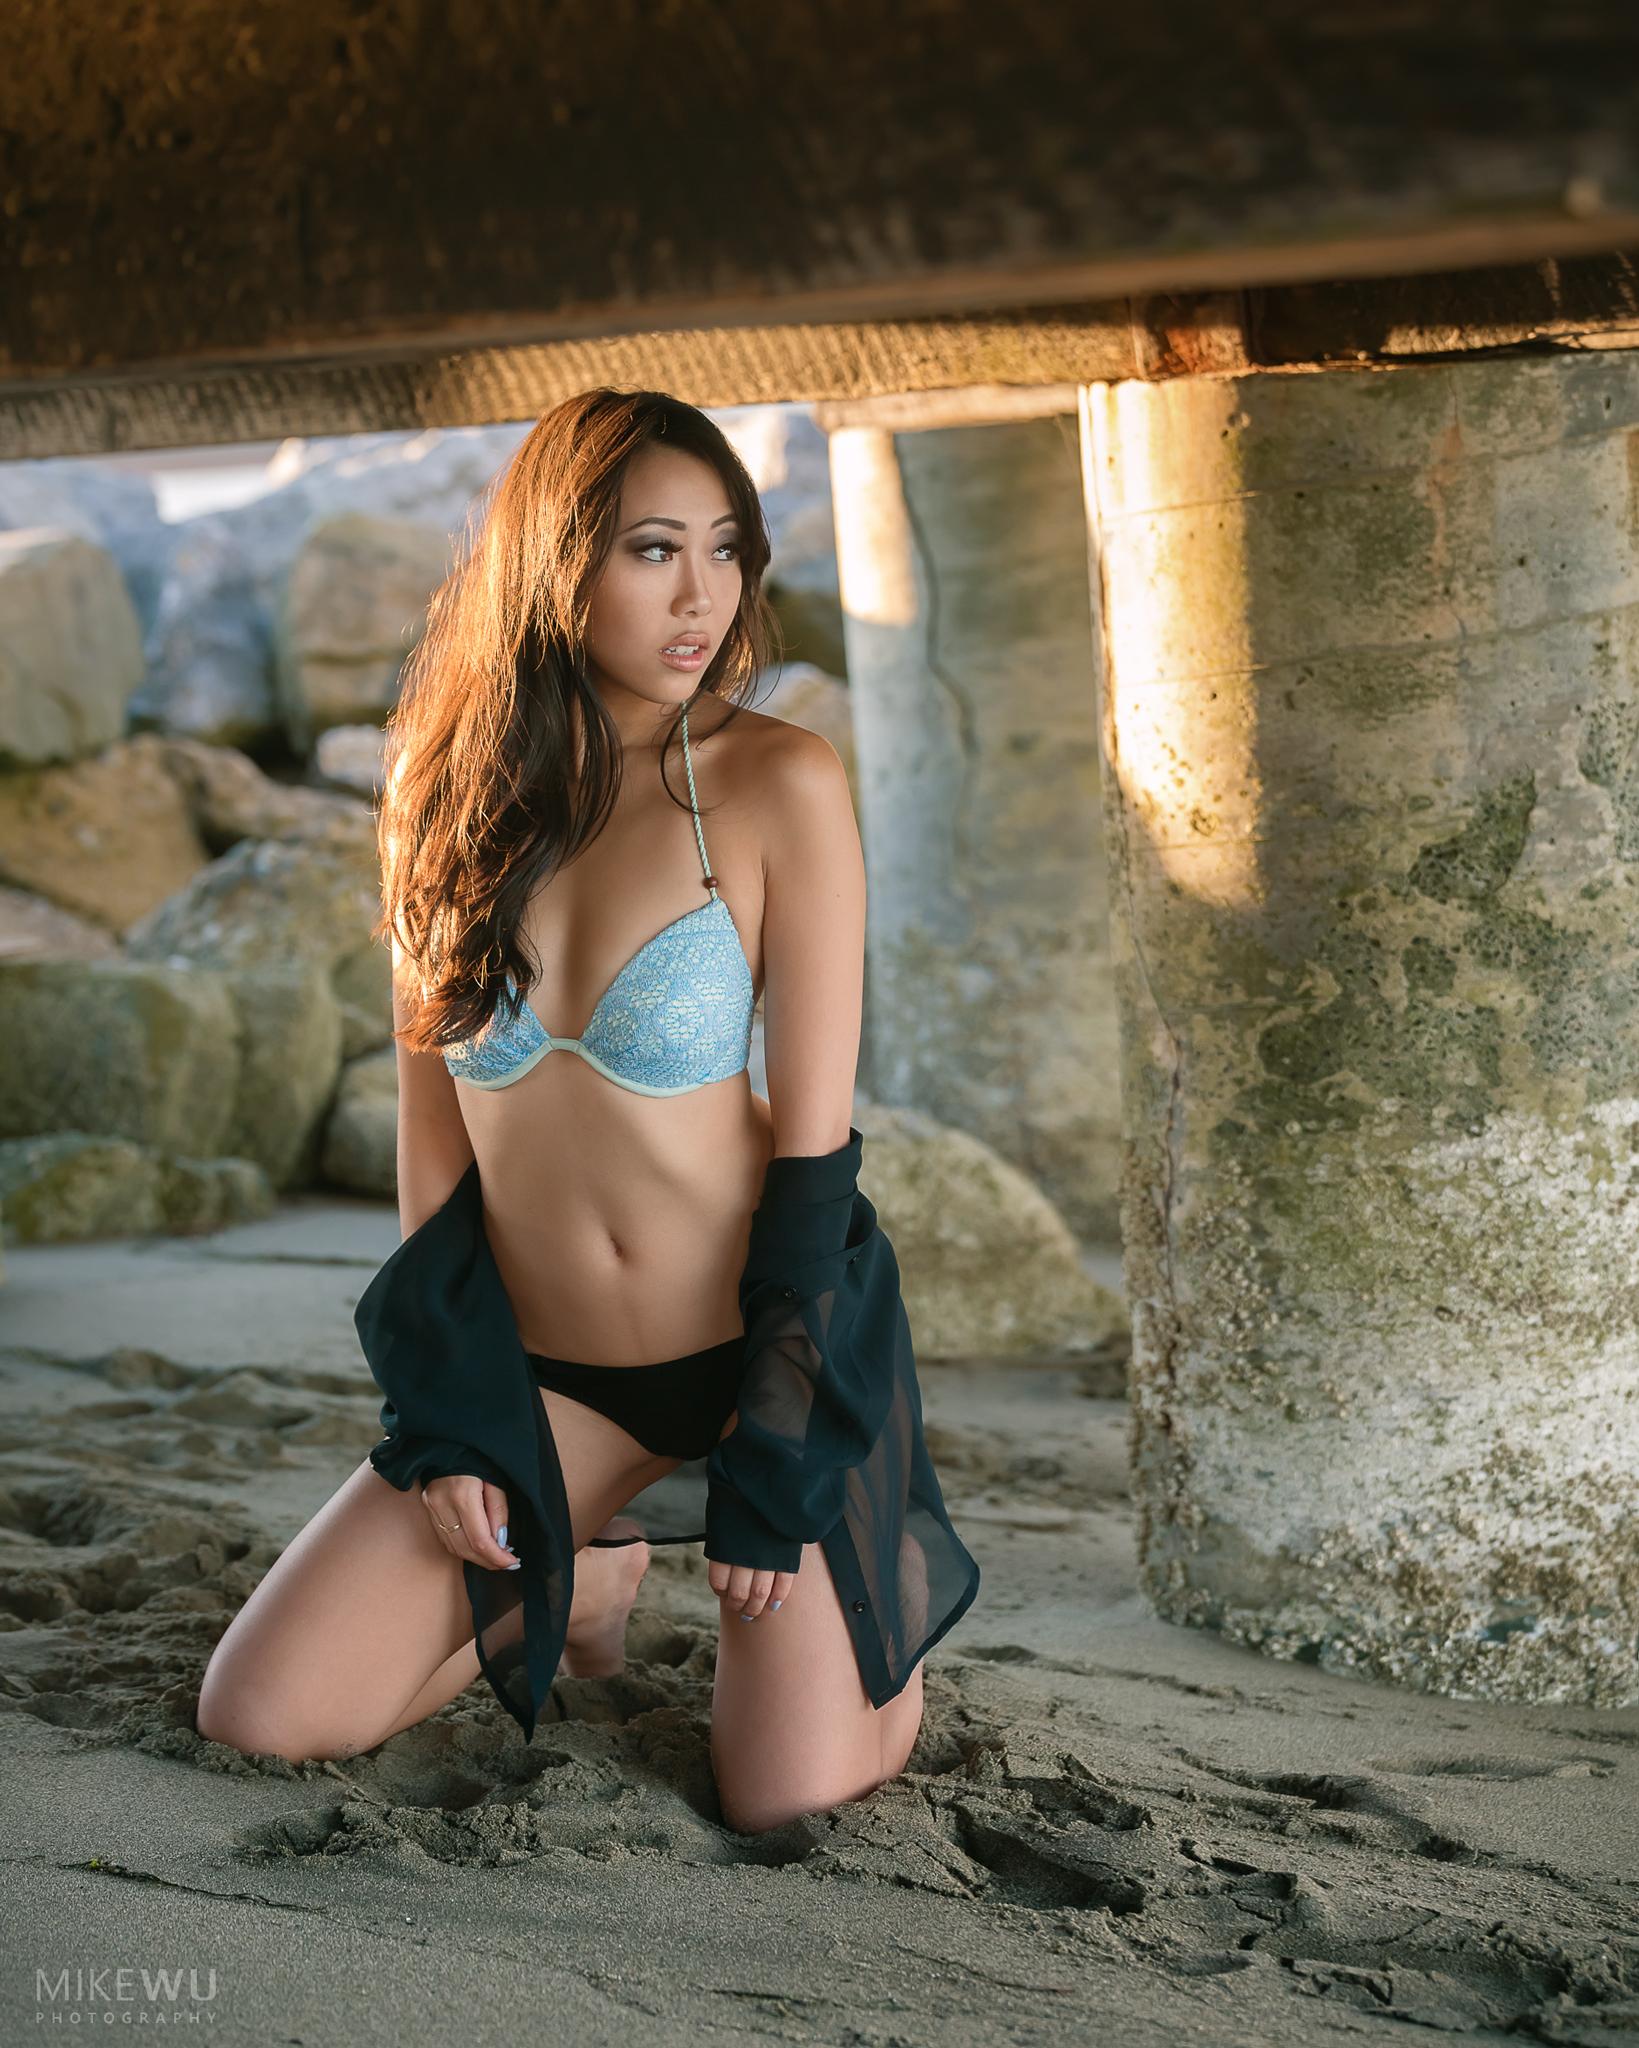 vancouver portrait photographer mike wu beach dock sunset golden hour natural light sand pier bikini female model swimsuit swimwear asian beauty beautiful blue gaze jericho kitslano spanish banks english bay